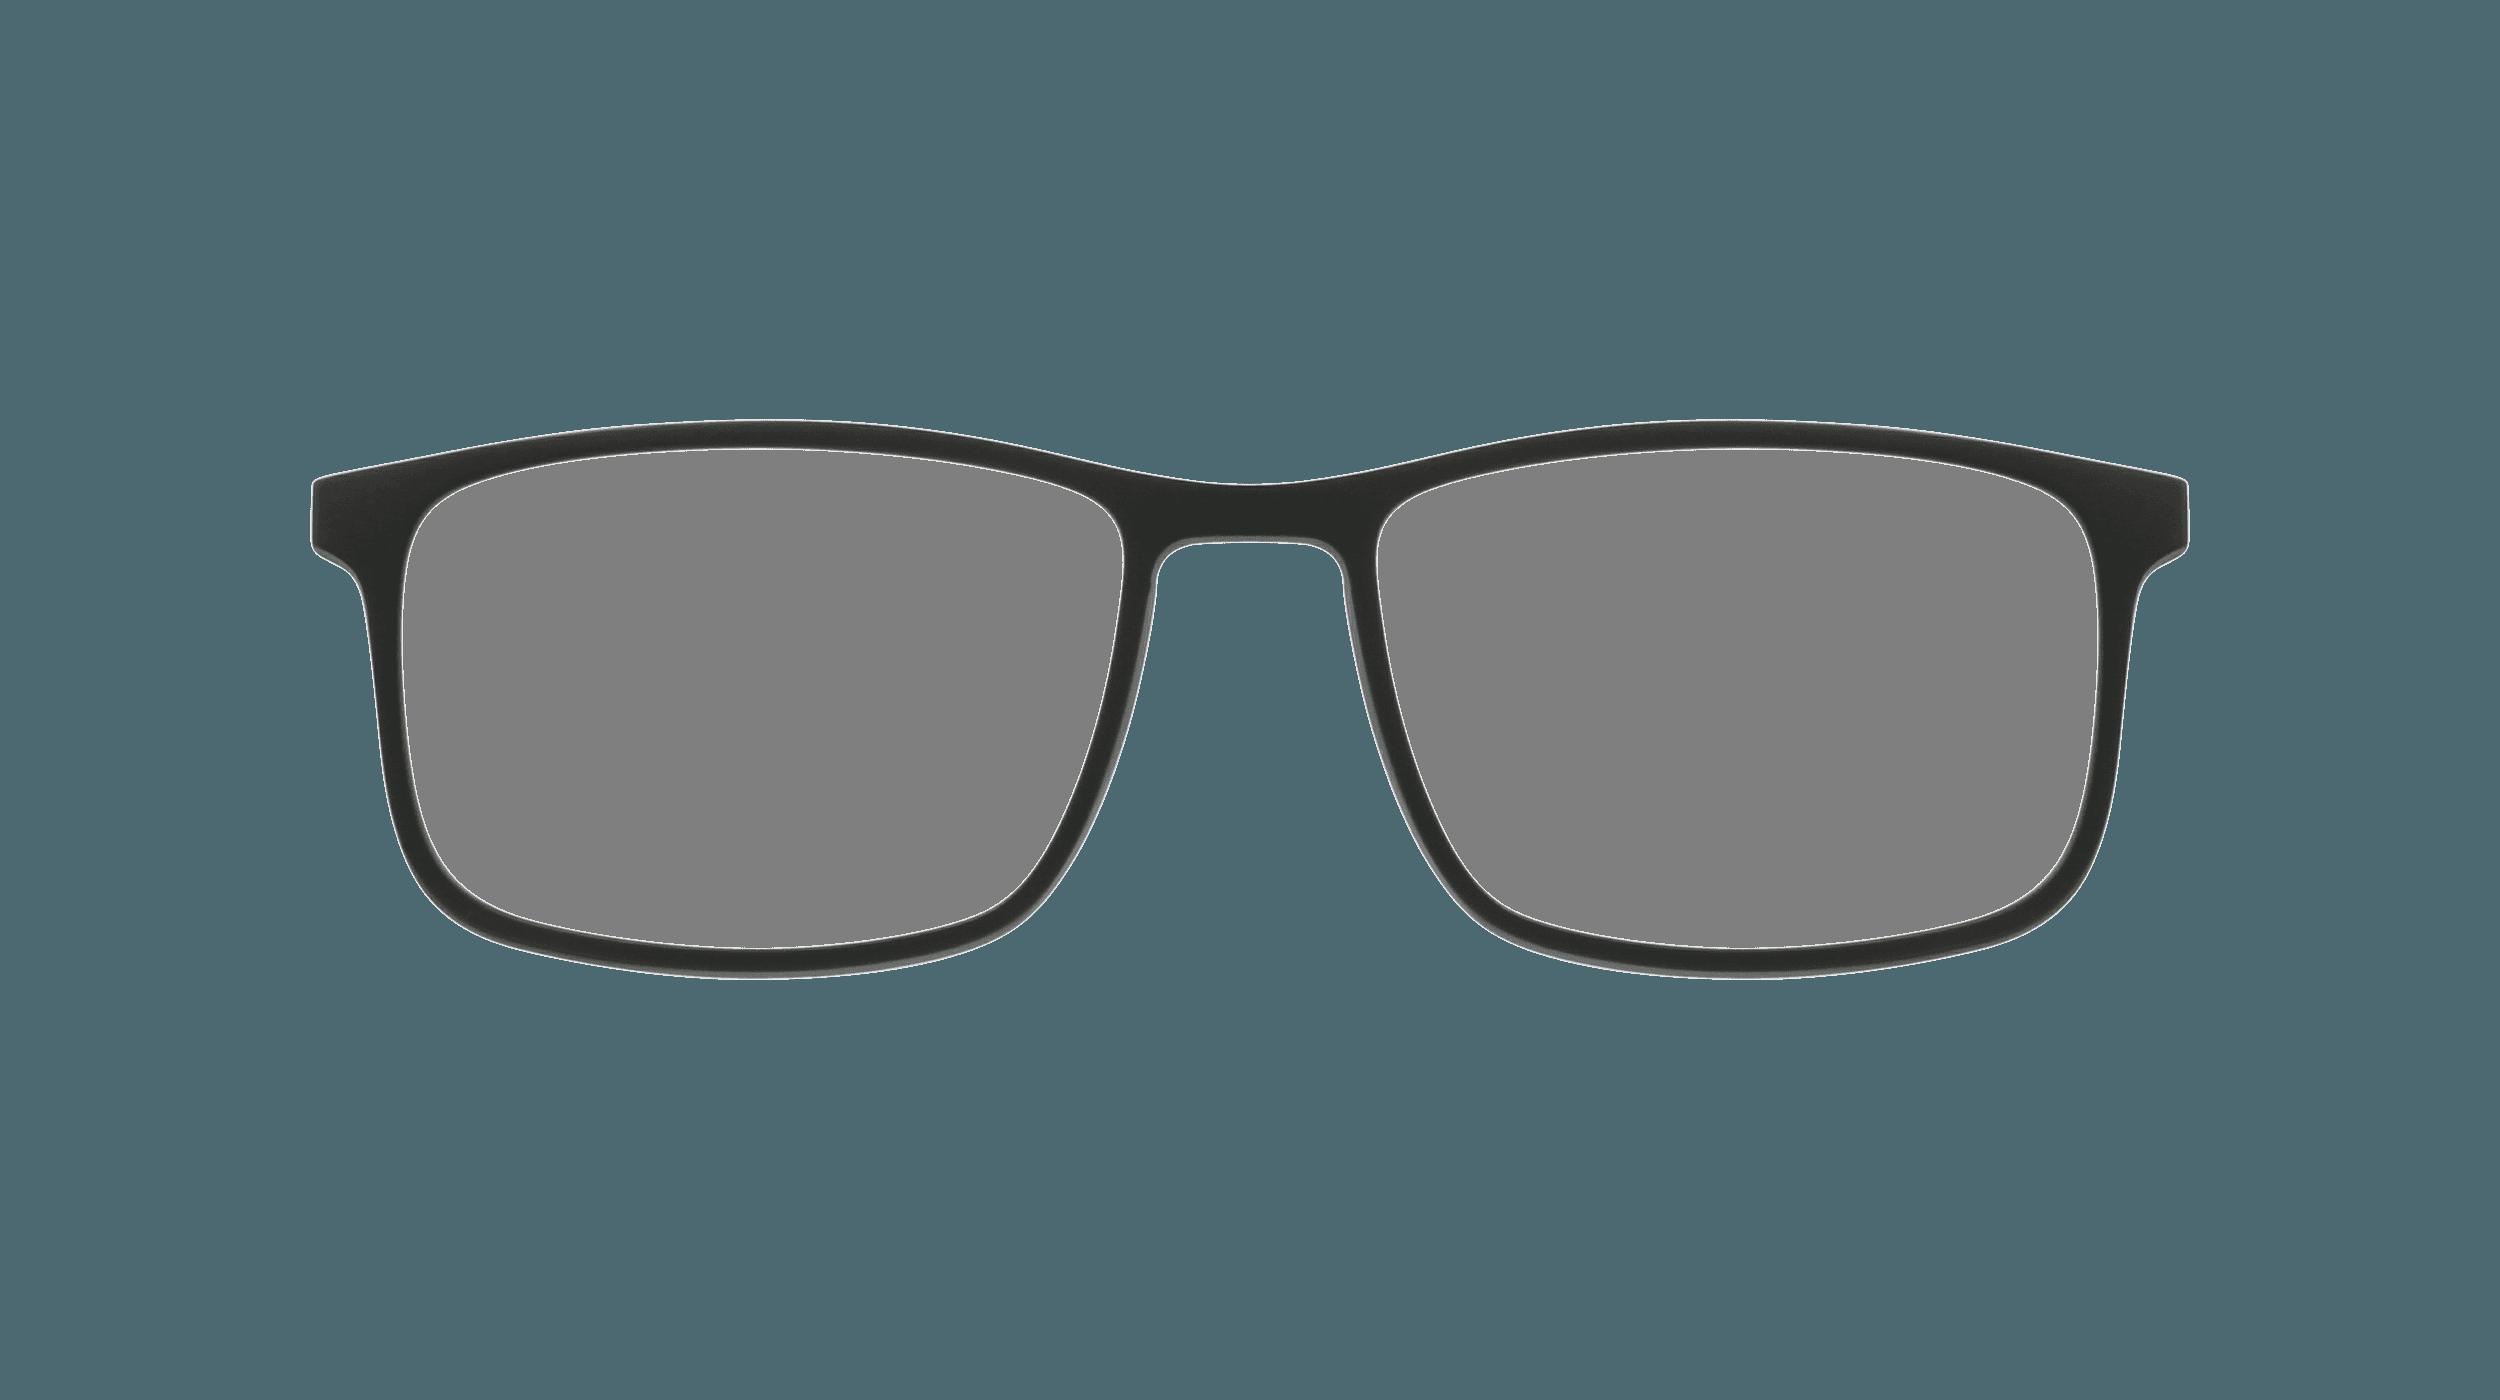 afflelou/france/products/smart_clip/clips_glasses/07630036458655.png